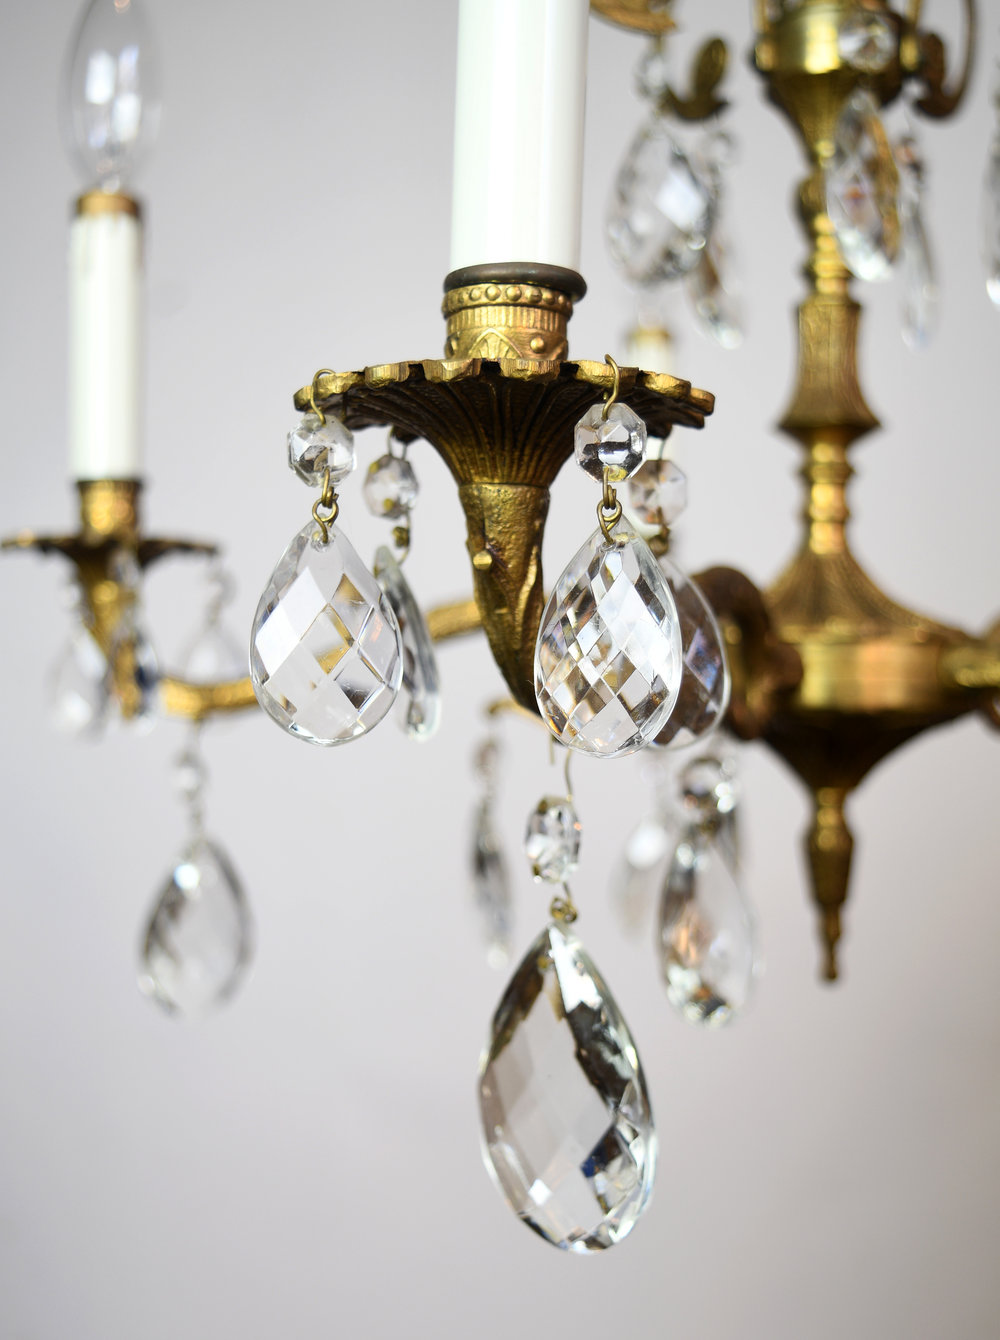 5-arm-spanish-chandelier-24.jpg